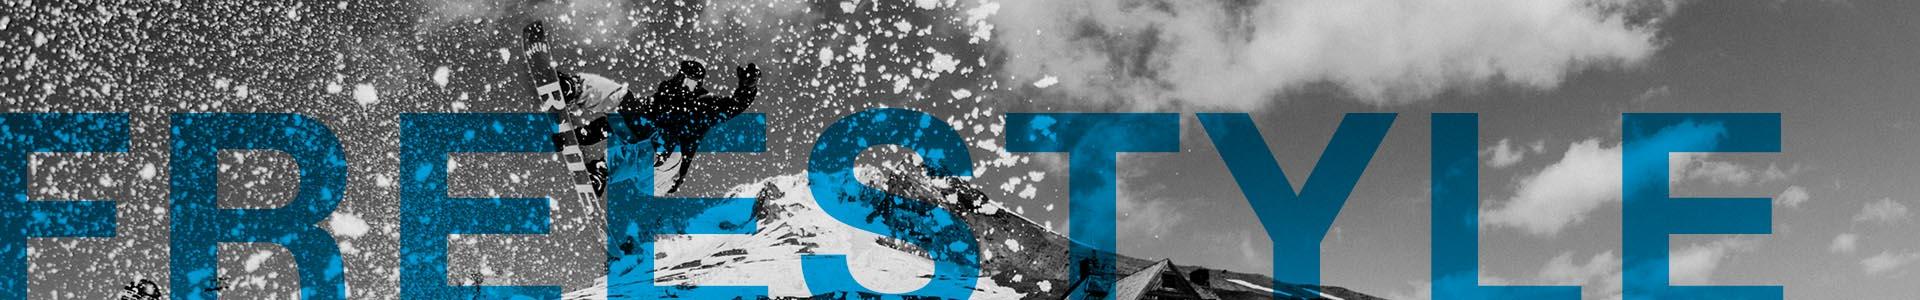 snowboard-snowboards-freestyle-1920x300.jpg